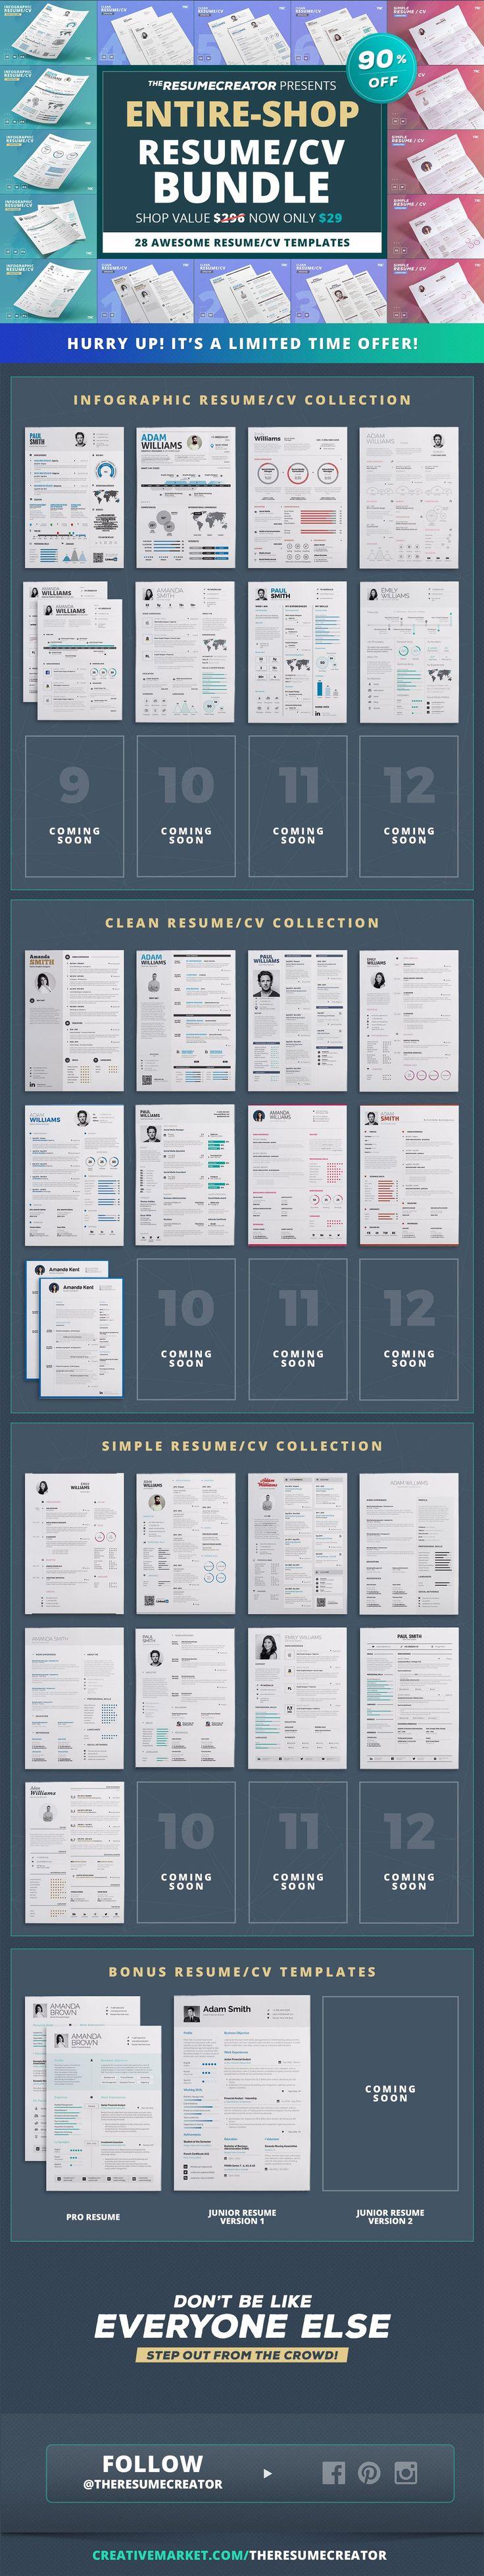 cool ResumeCv templates Bundle 25 best Resume